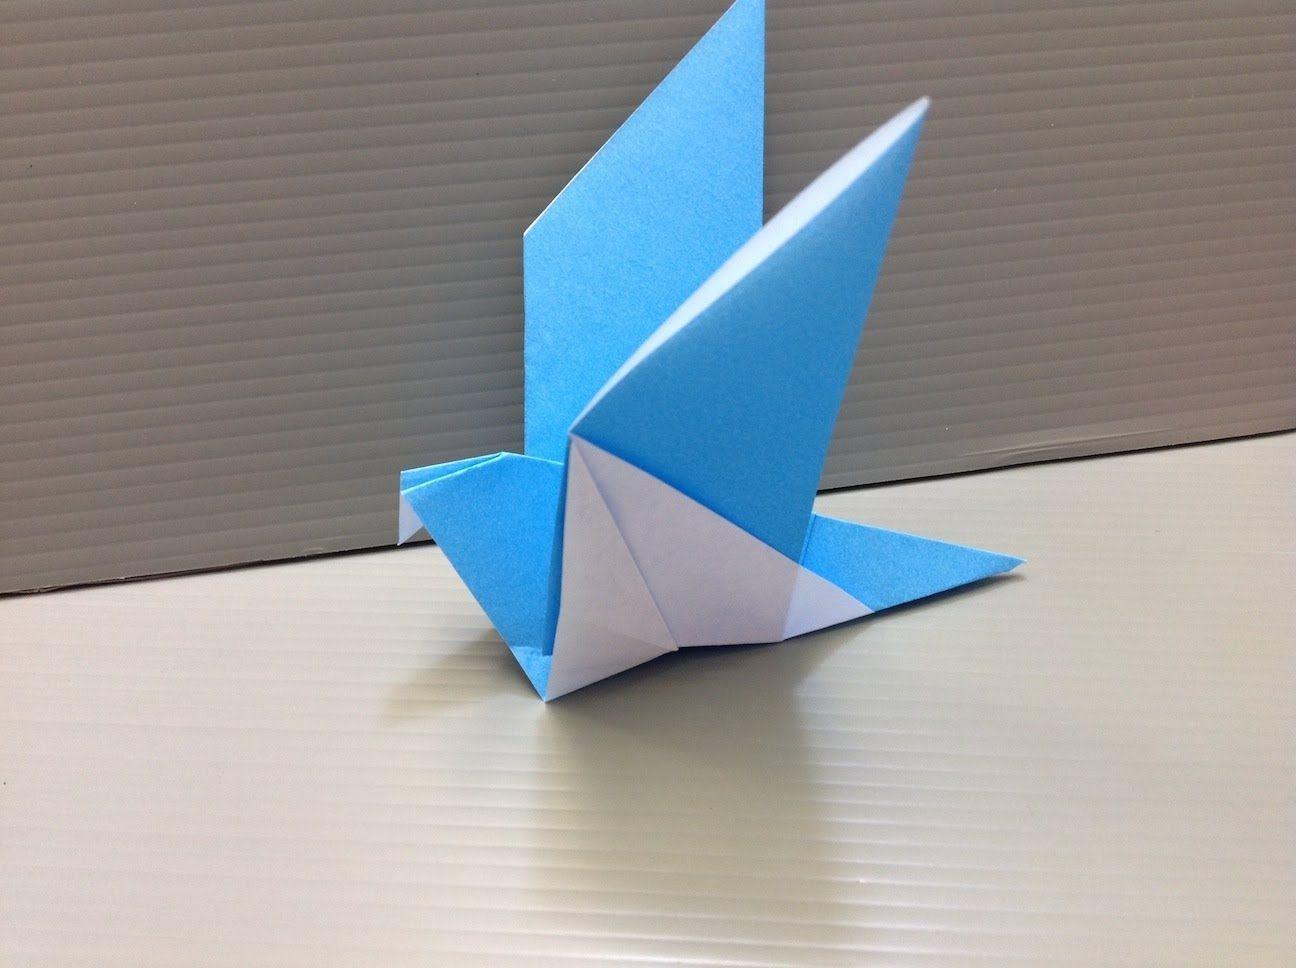 Origami - Wikipedia | 968x1296